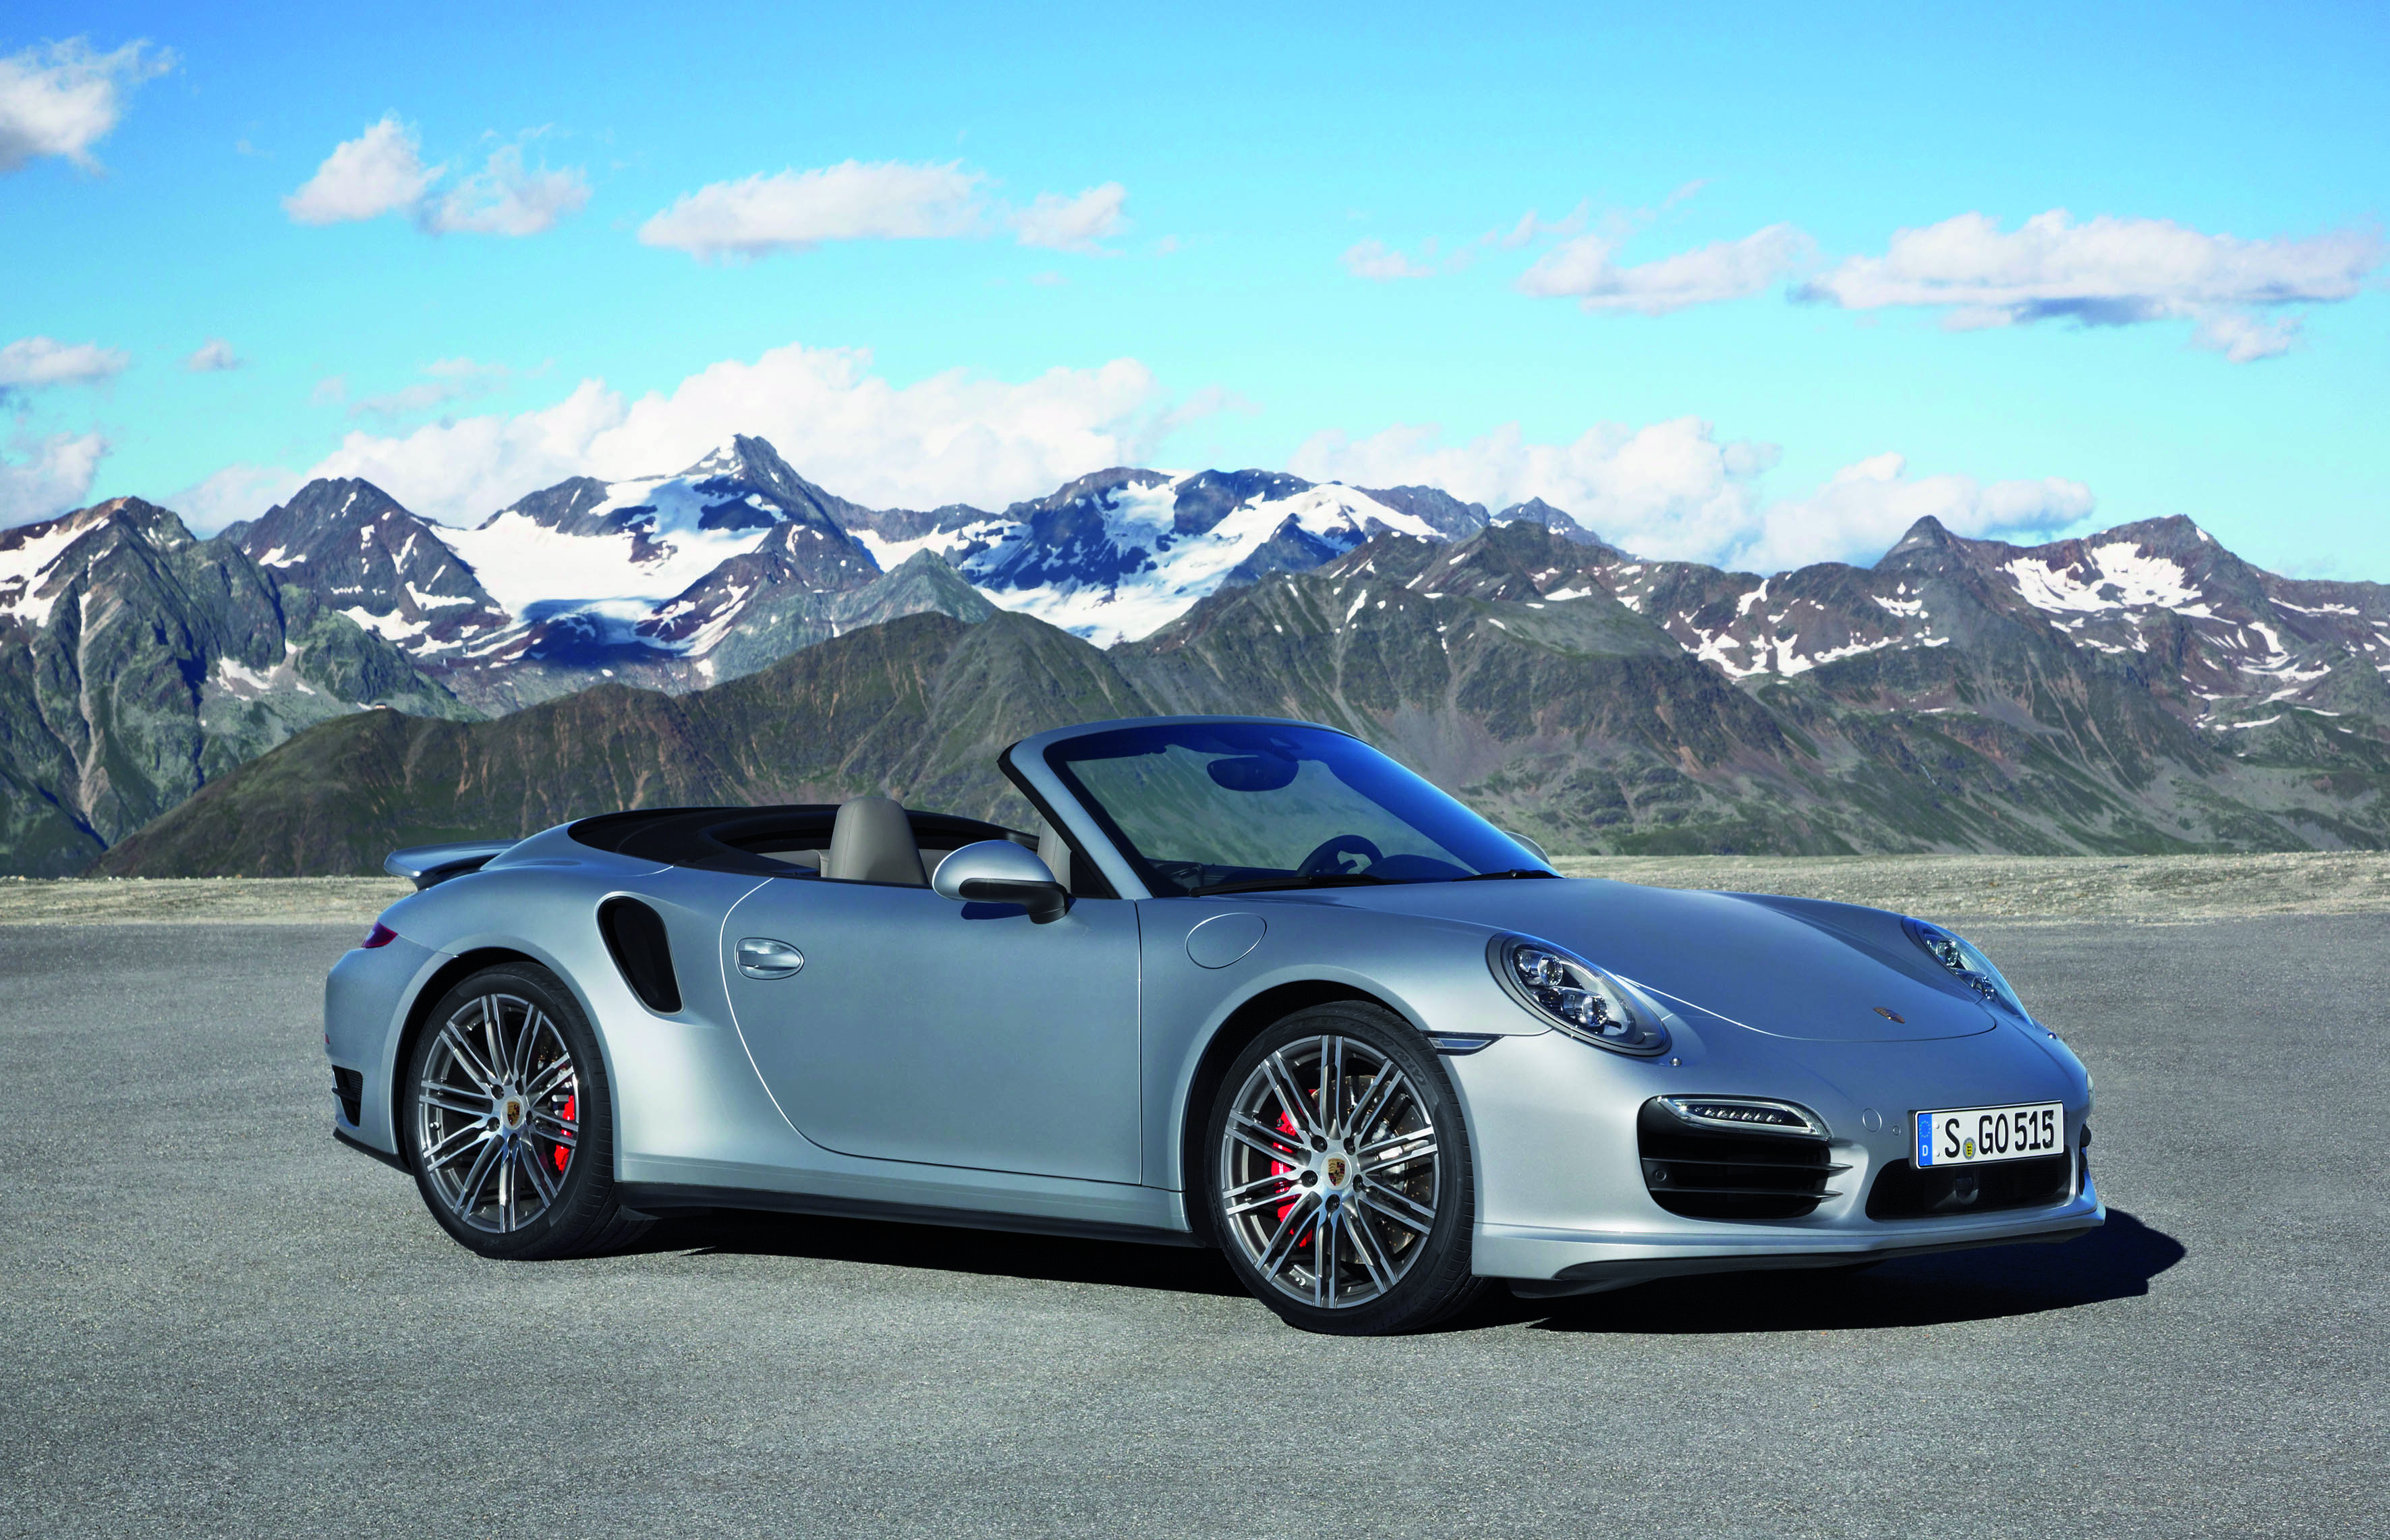 porsche 911 turbo cabriolet und 911 turbo s cabriolet faszination autos. Black Bedroom Furniture Sets. Home Design Ideas